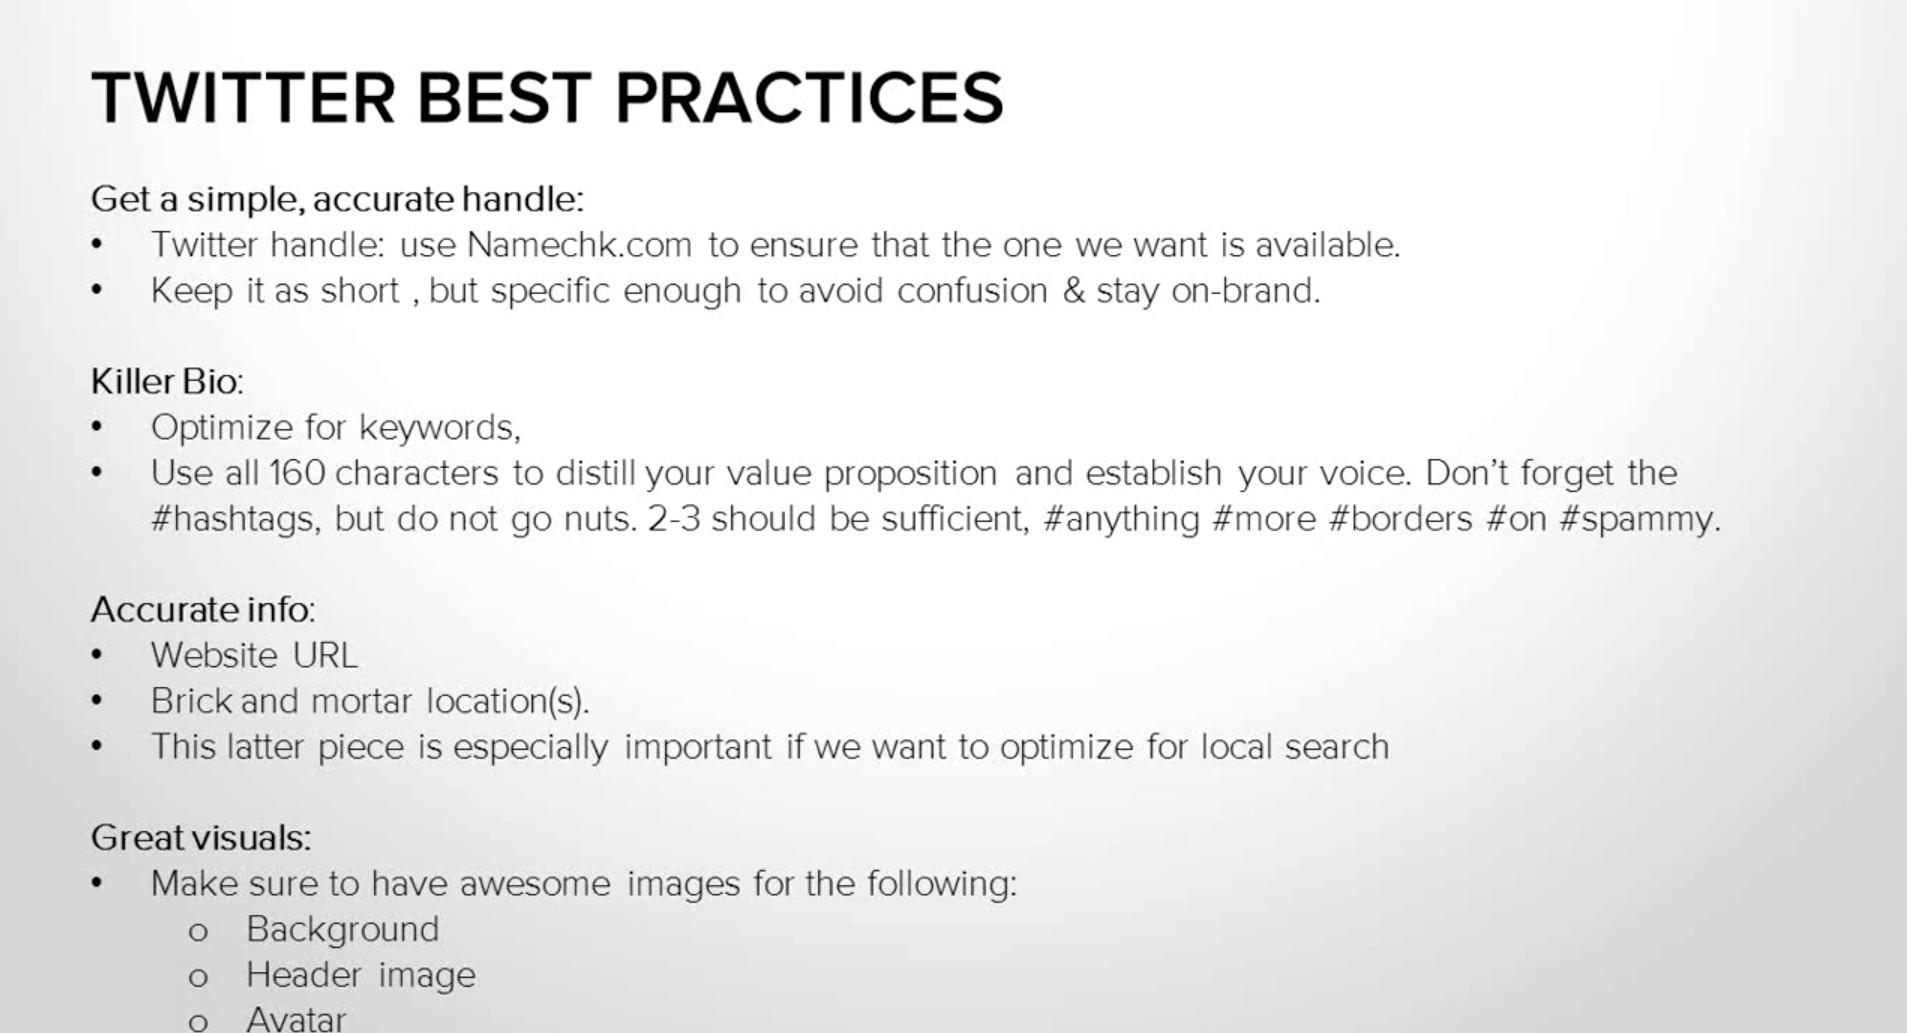 Twitter Best Practices from HubSpot